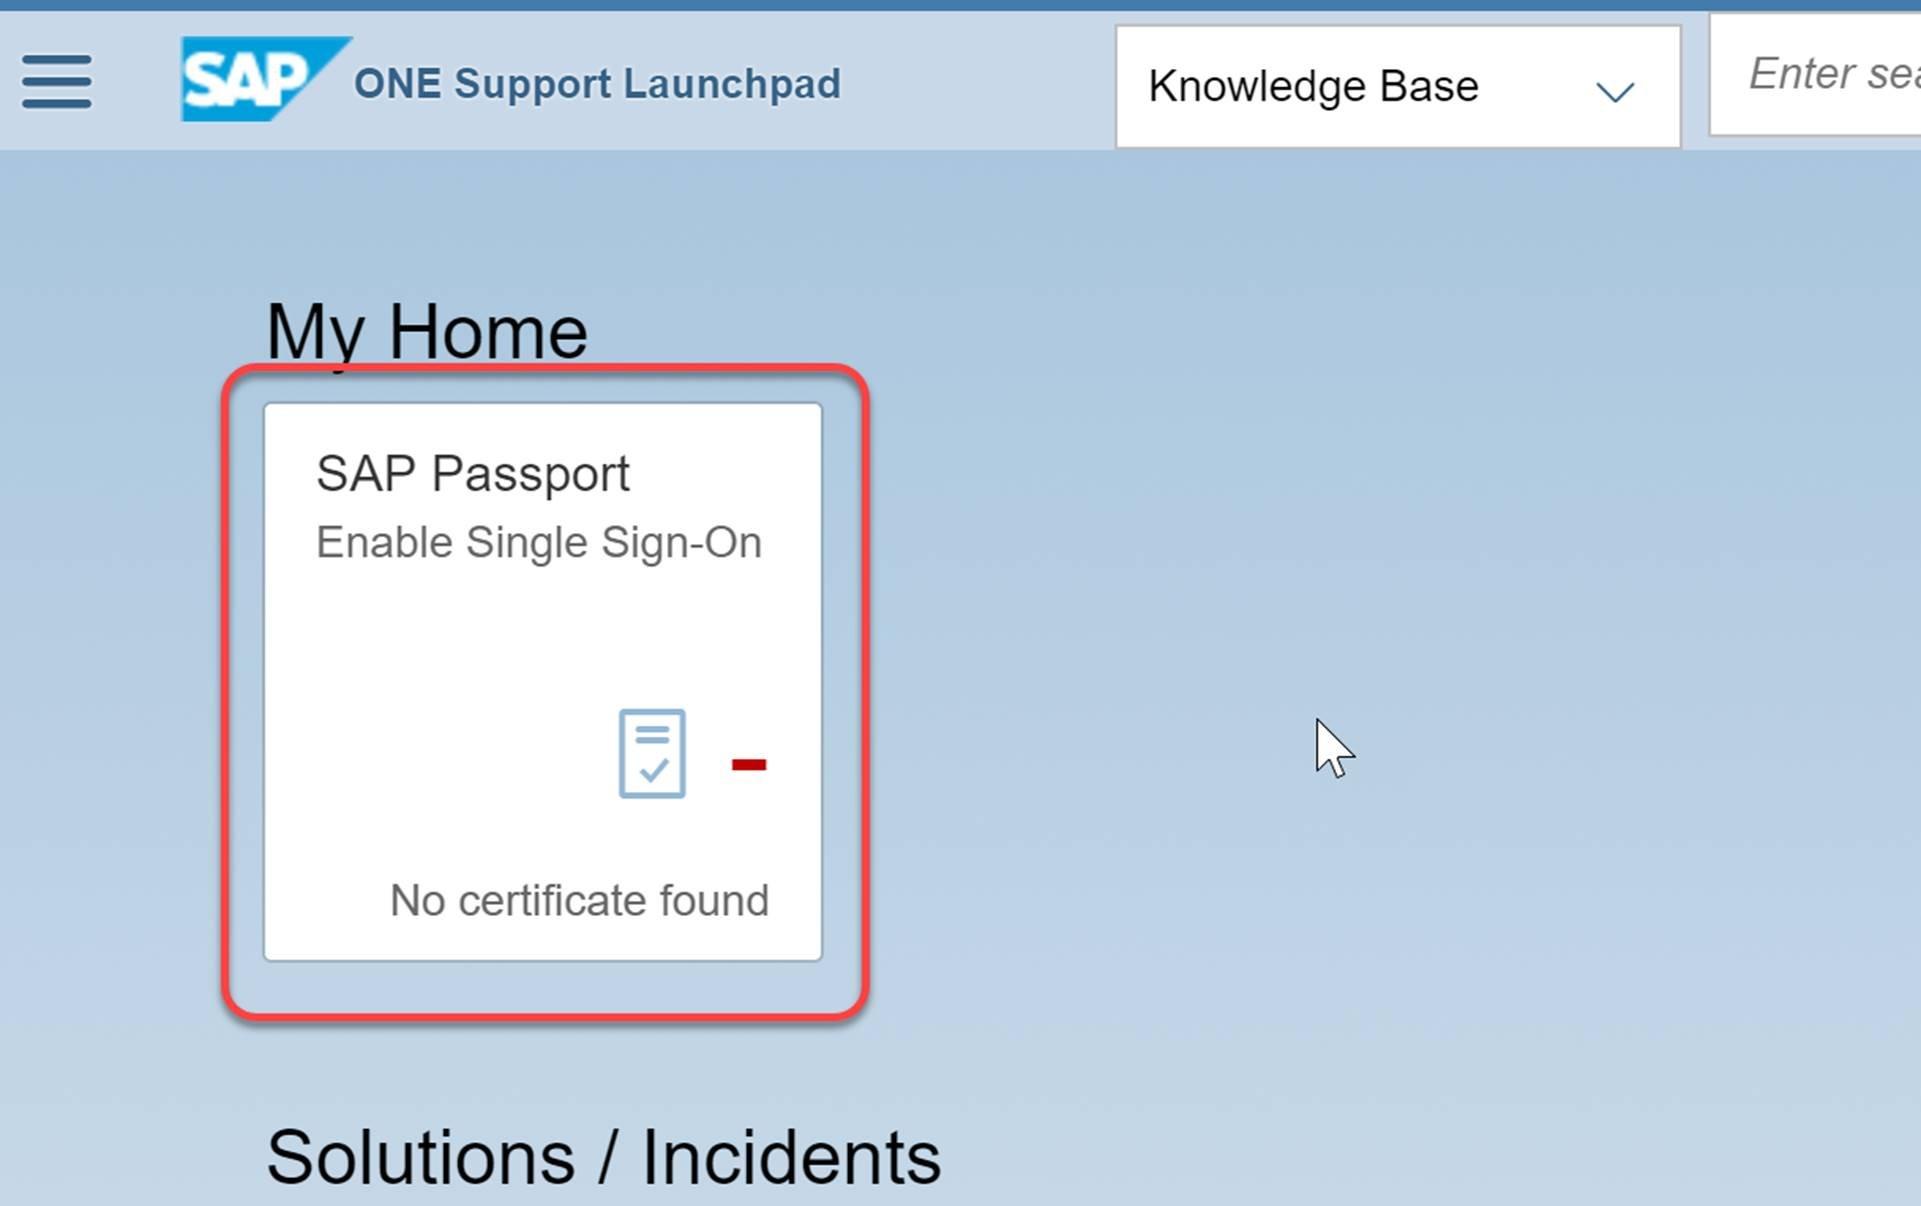 Client-Zertifikat: My Home